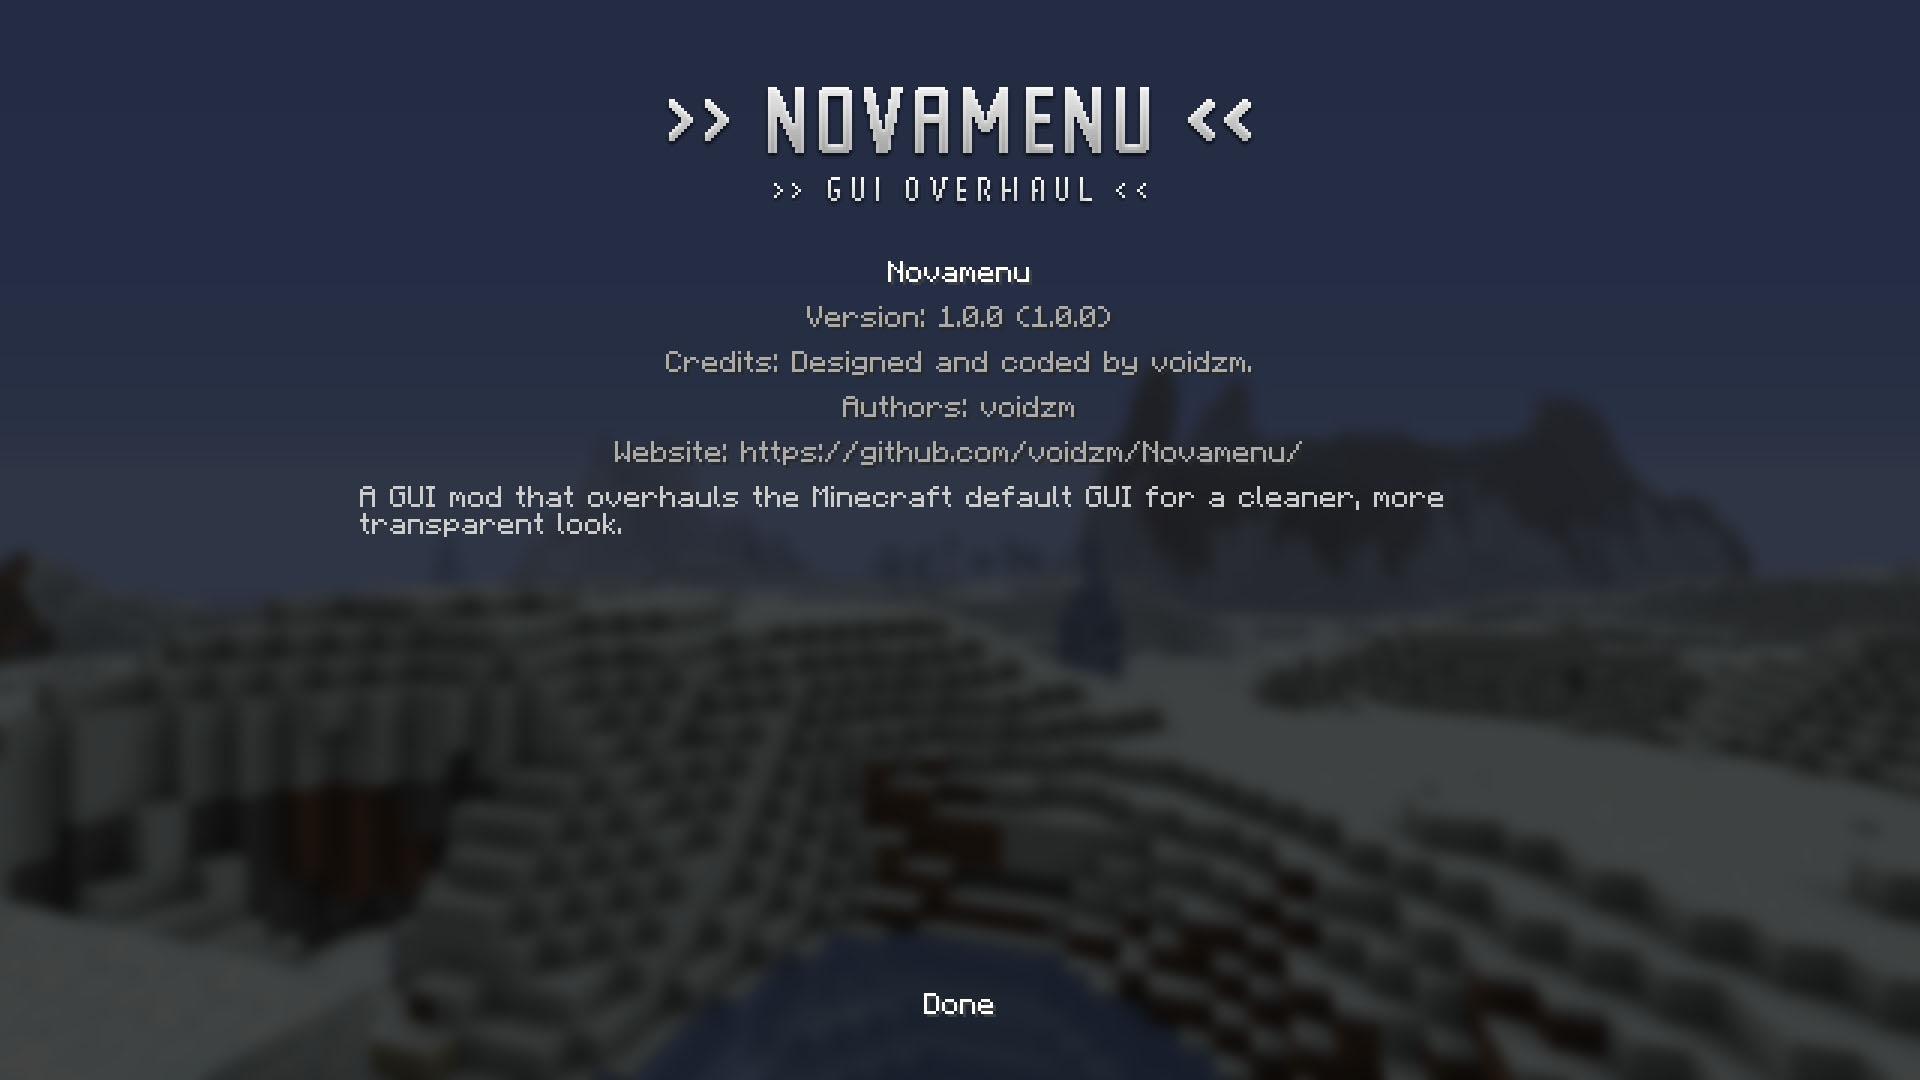 http://img.niceminecraft.net/Mods/Novamenu-Mod-2.jpg